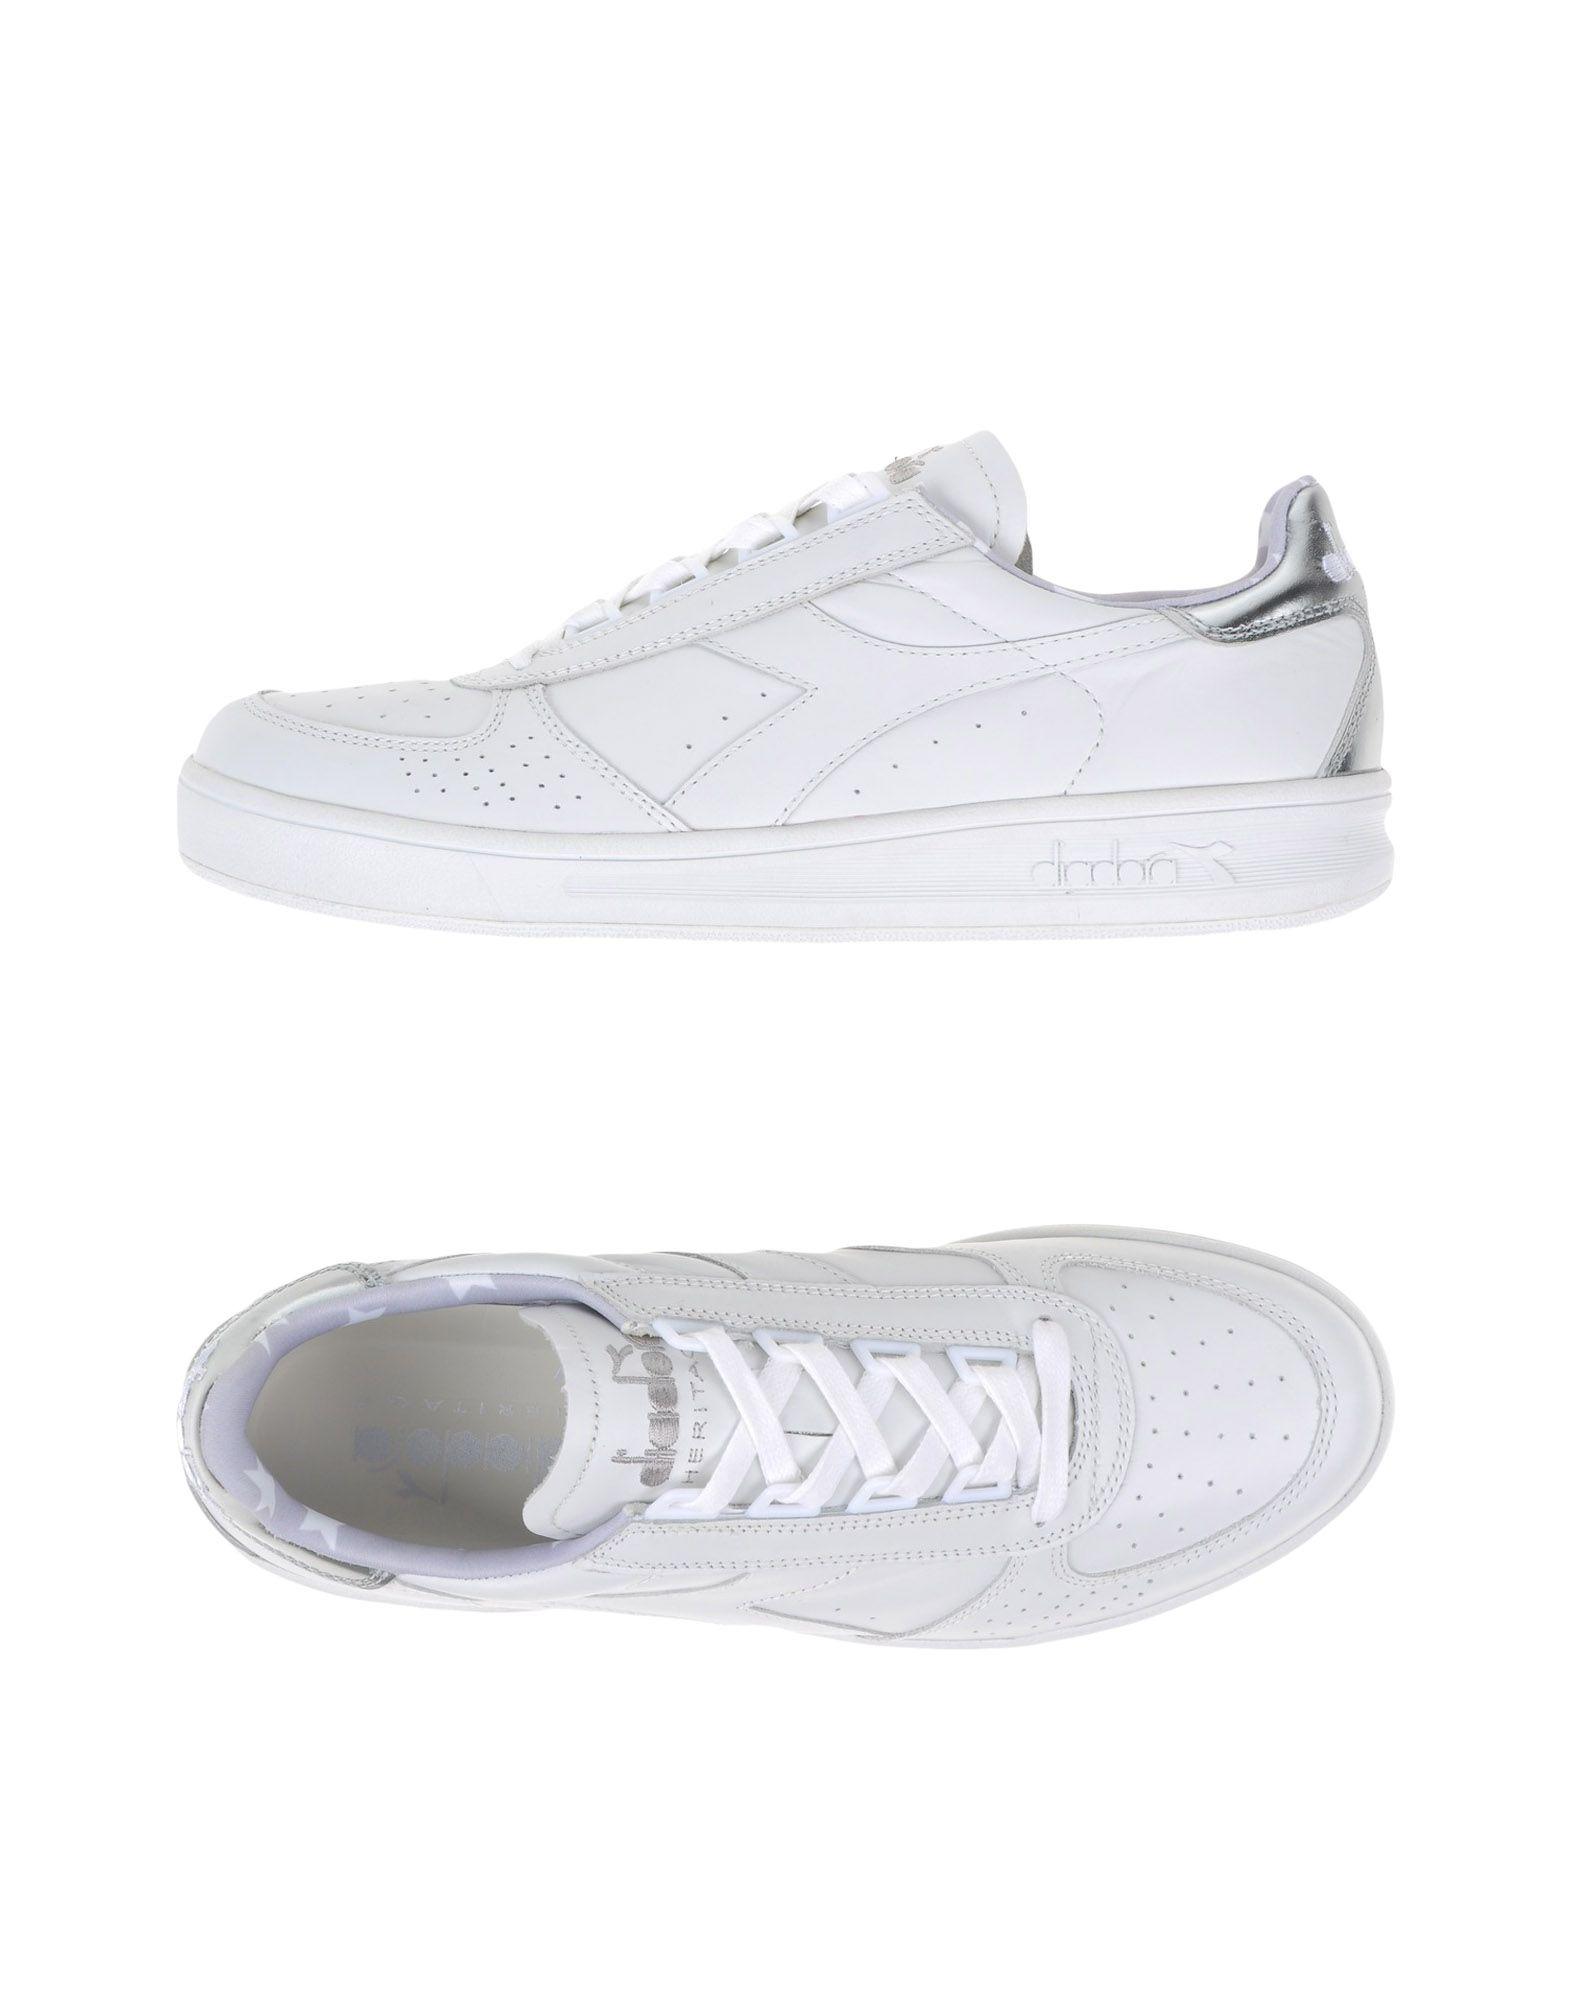 Sneakers Diadora Heritage B.Elite W Liquid - Uomo - Acquista online su